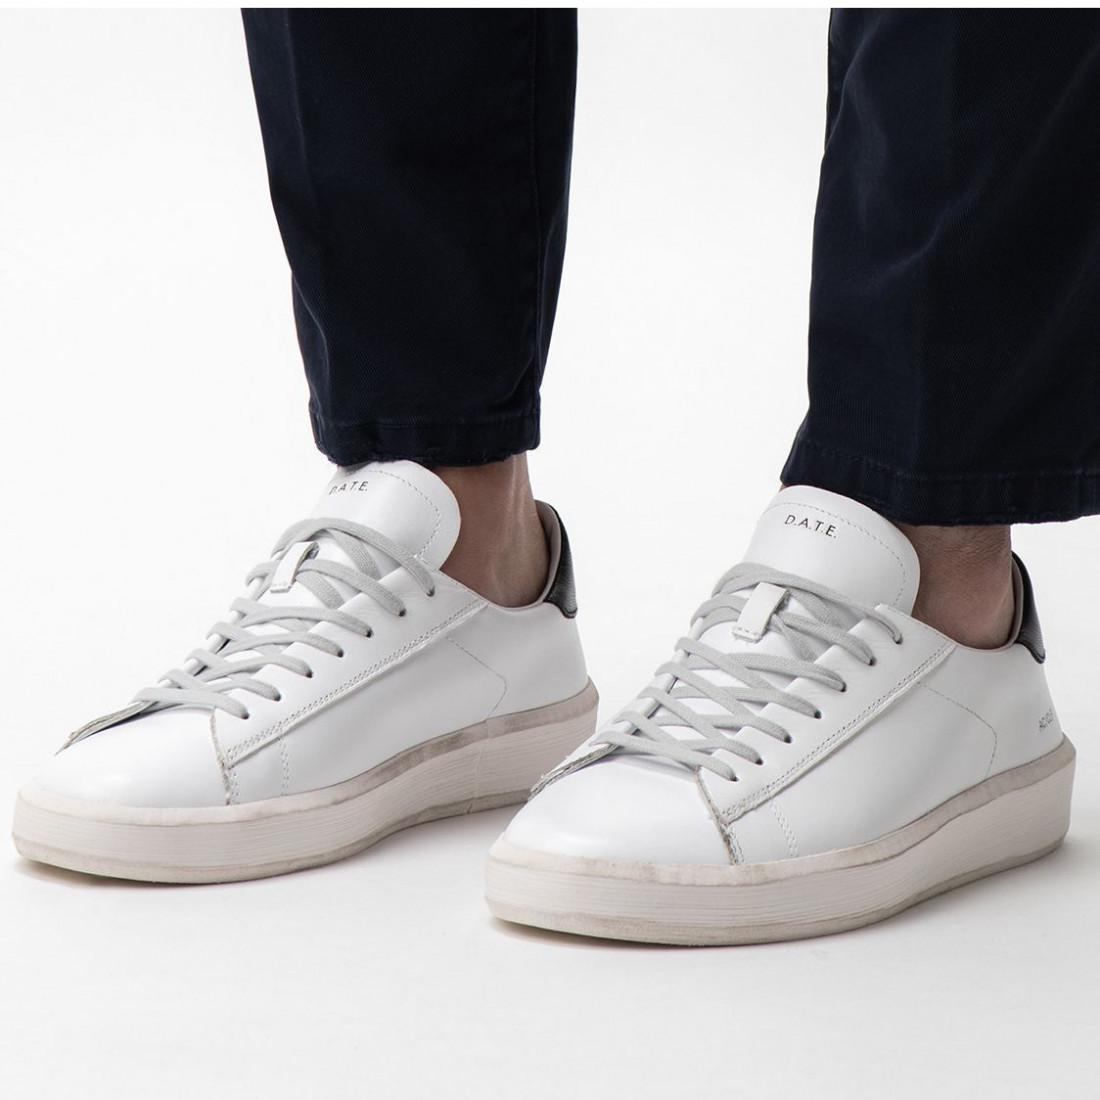 sneakers uomo date ace m341 ac ca wb 8203